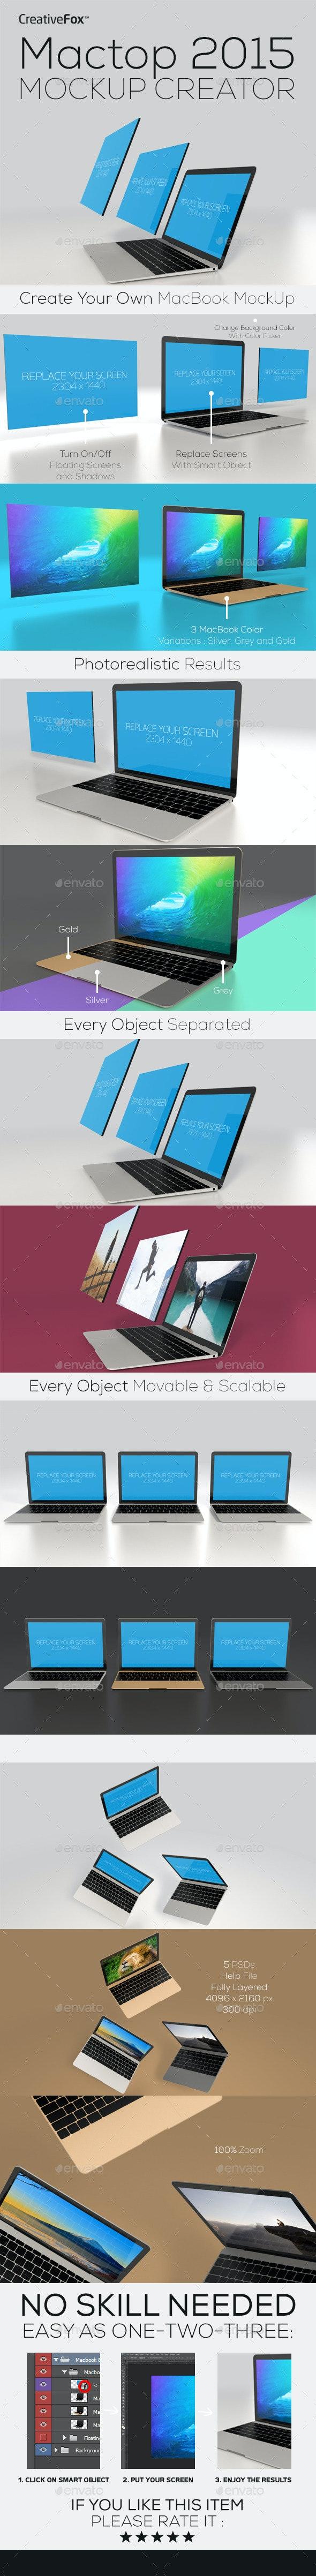 Mactop 2015 Mockup Creator - Laptop Mockup - Multiple Displays